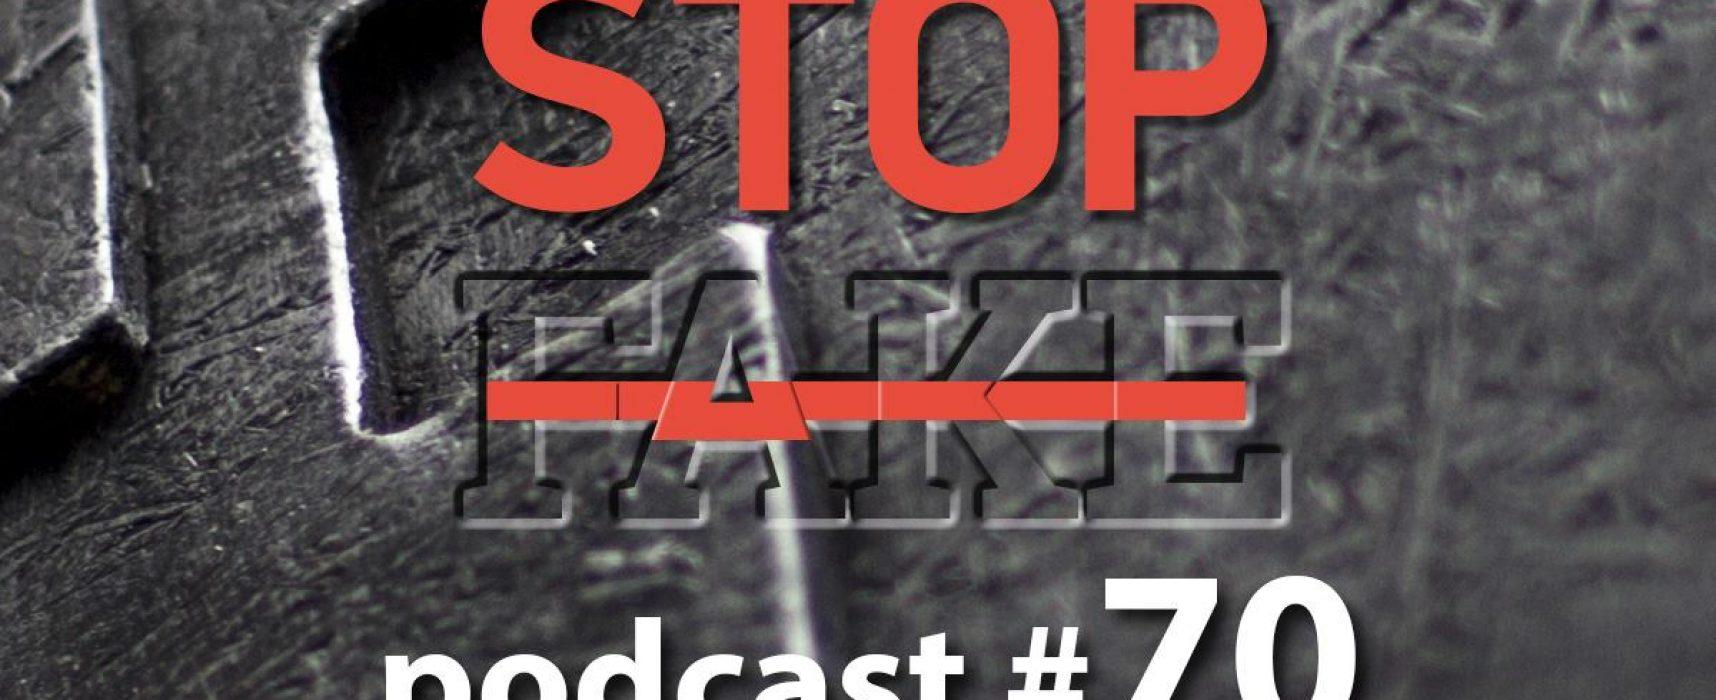 StopFake podcast #70